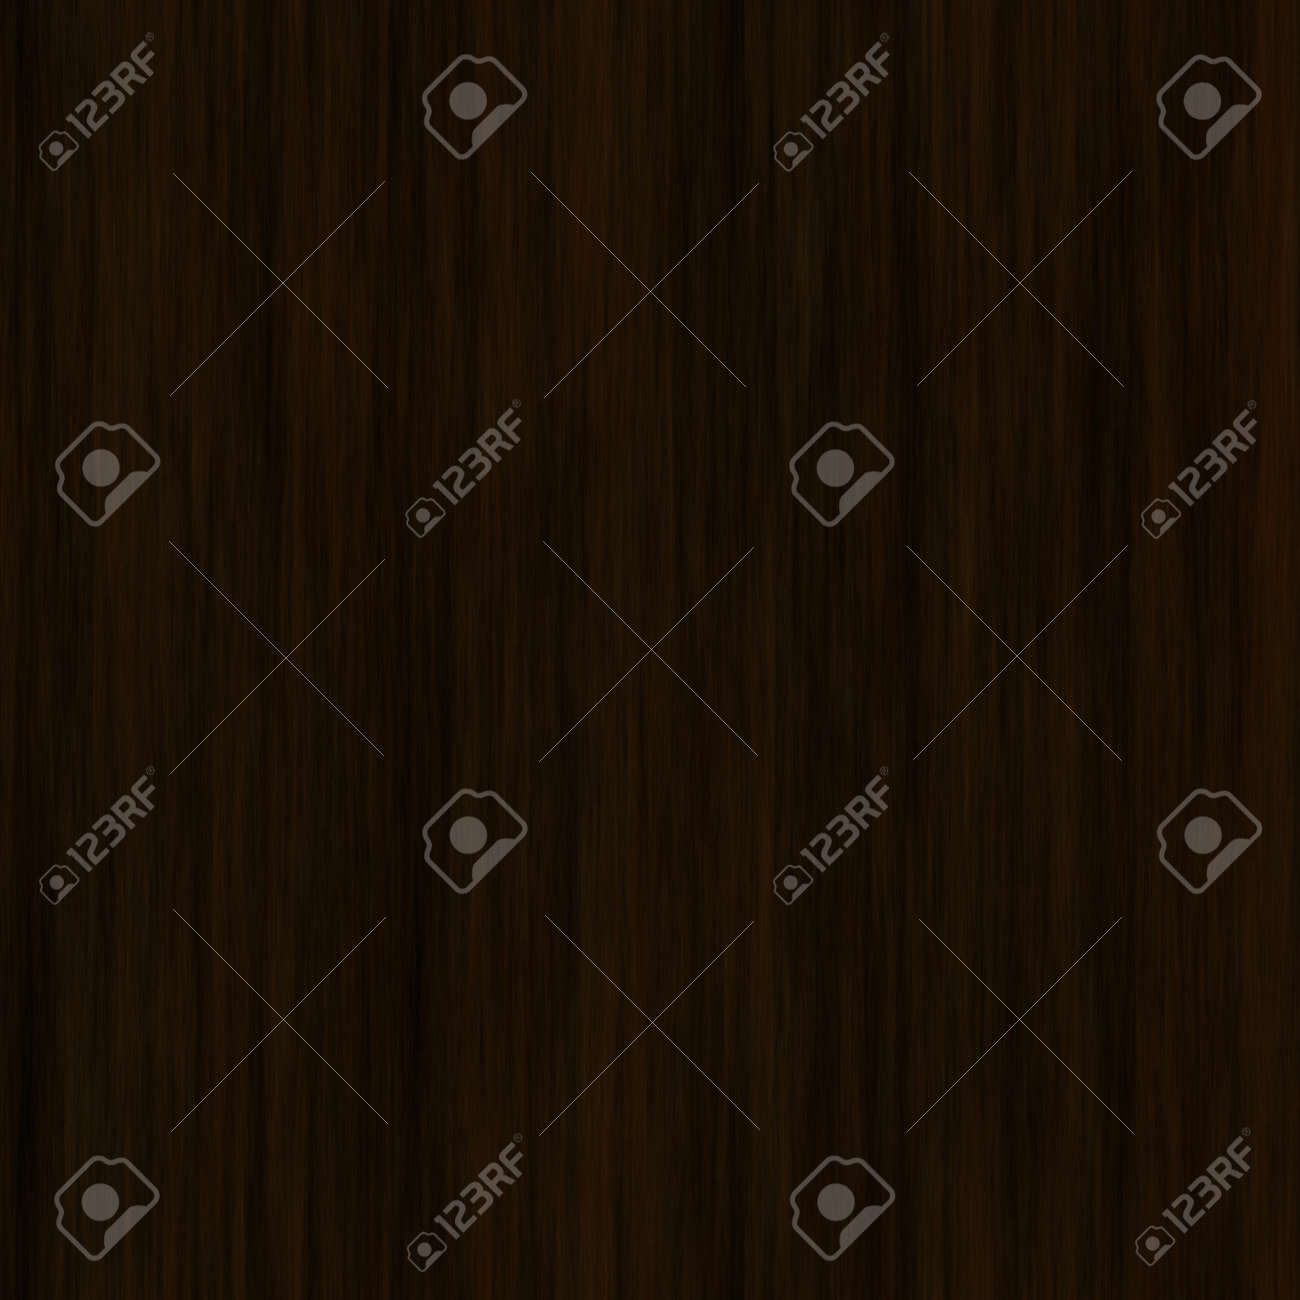 dark wood texture. Seamless Dark Wood Floor Texture. High Quality Resolution Texture For Interior Furniture